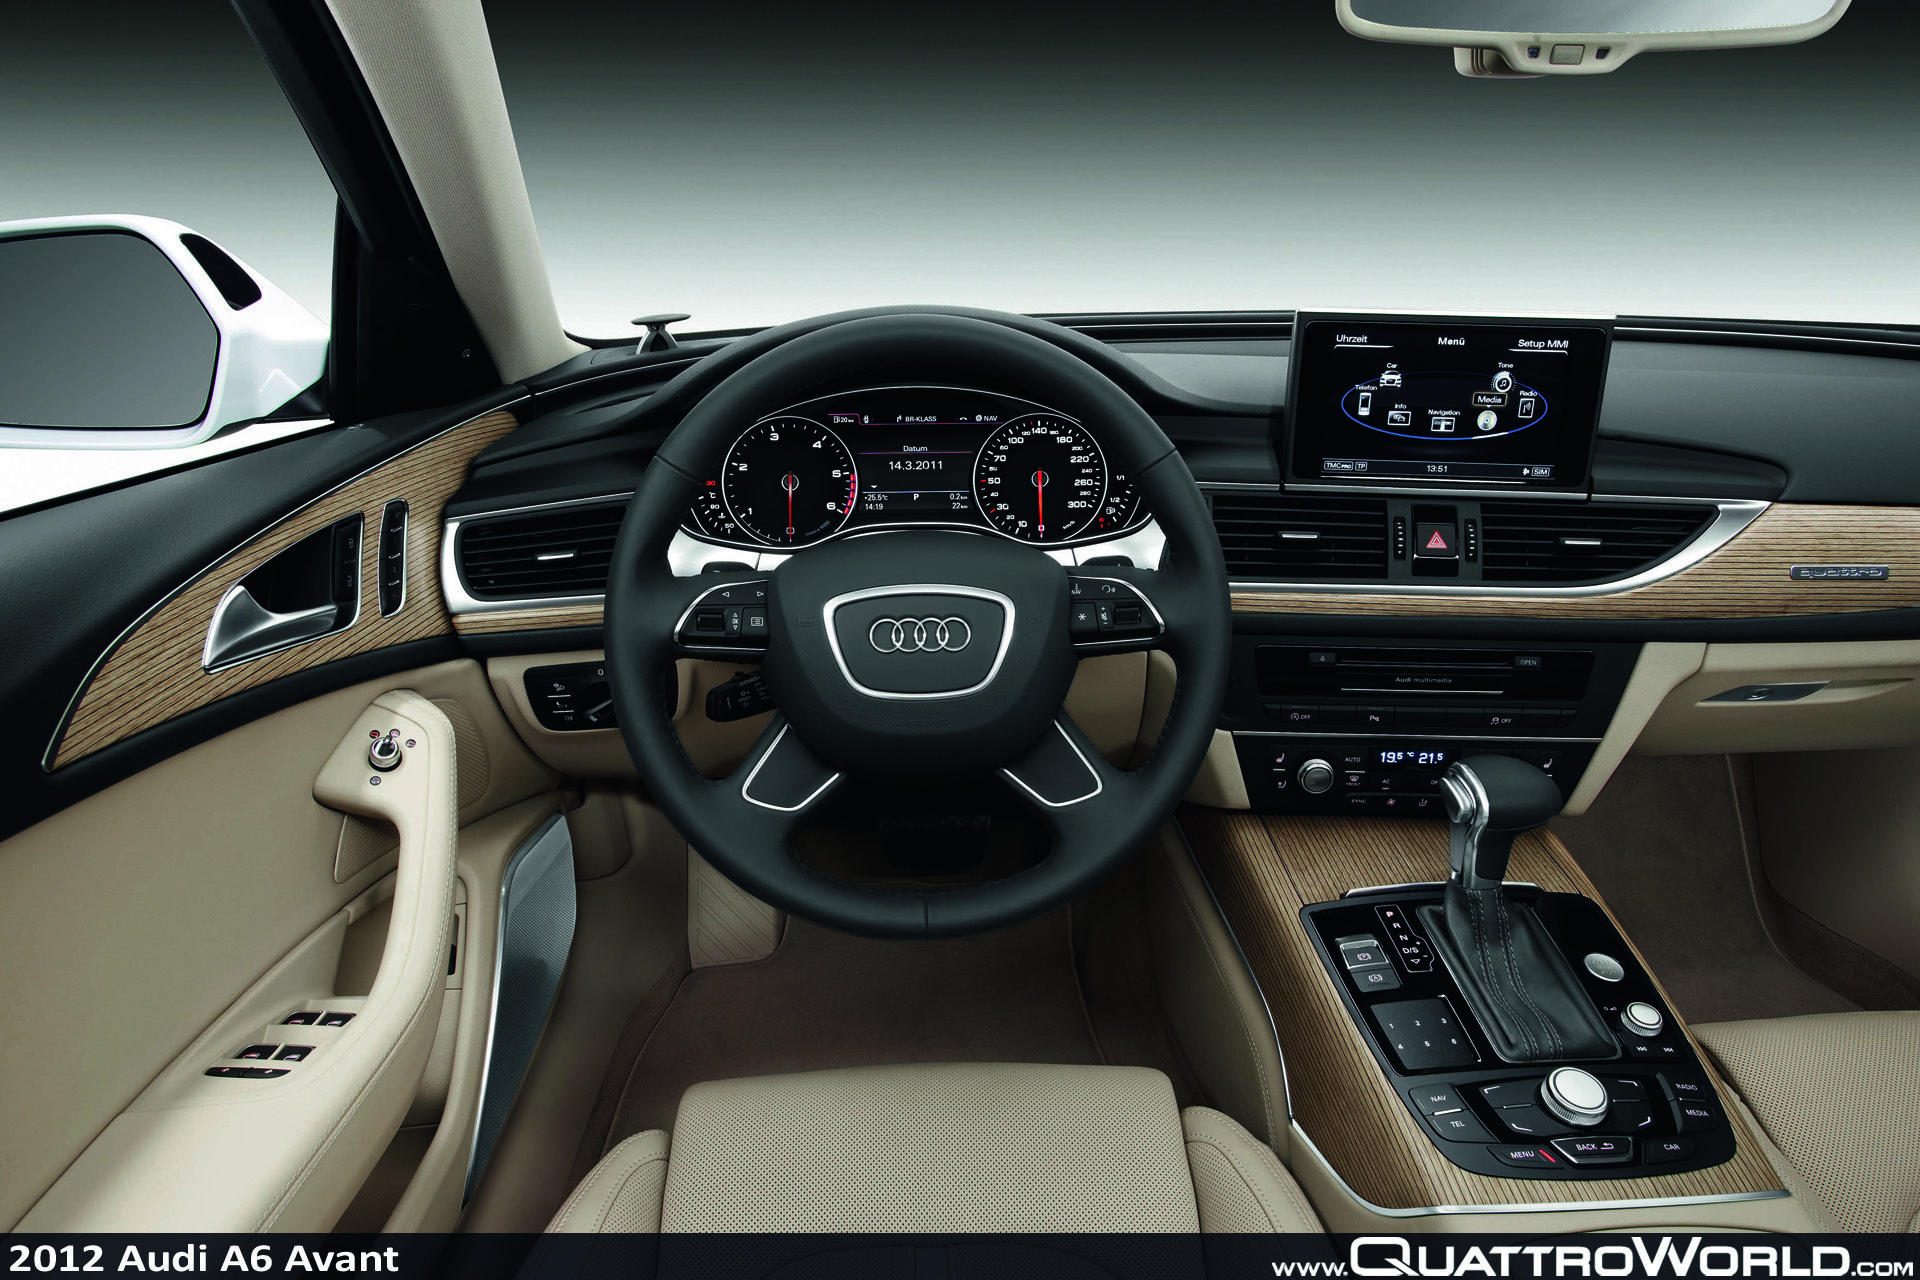 Audi A6 Avant Innenraum Love Life Audi Audi A6 Cars